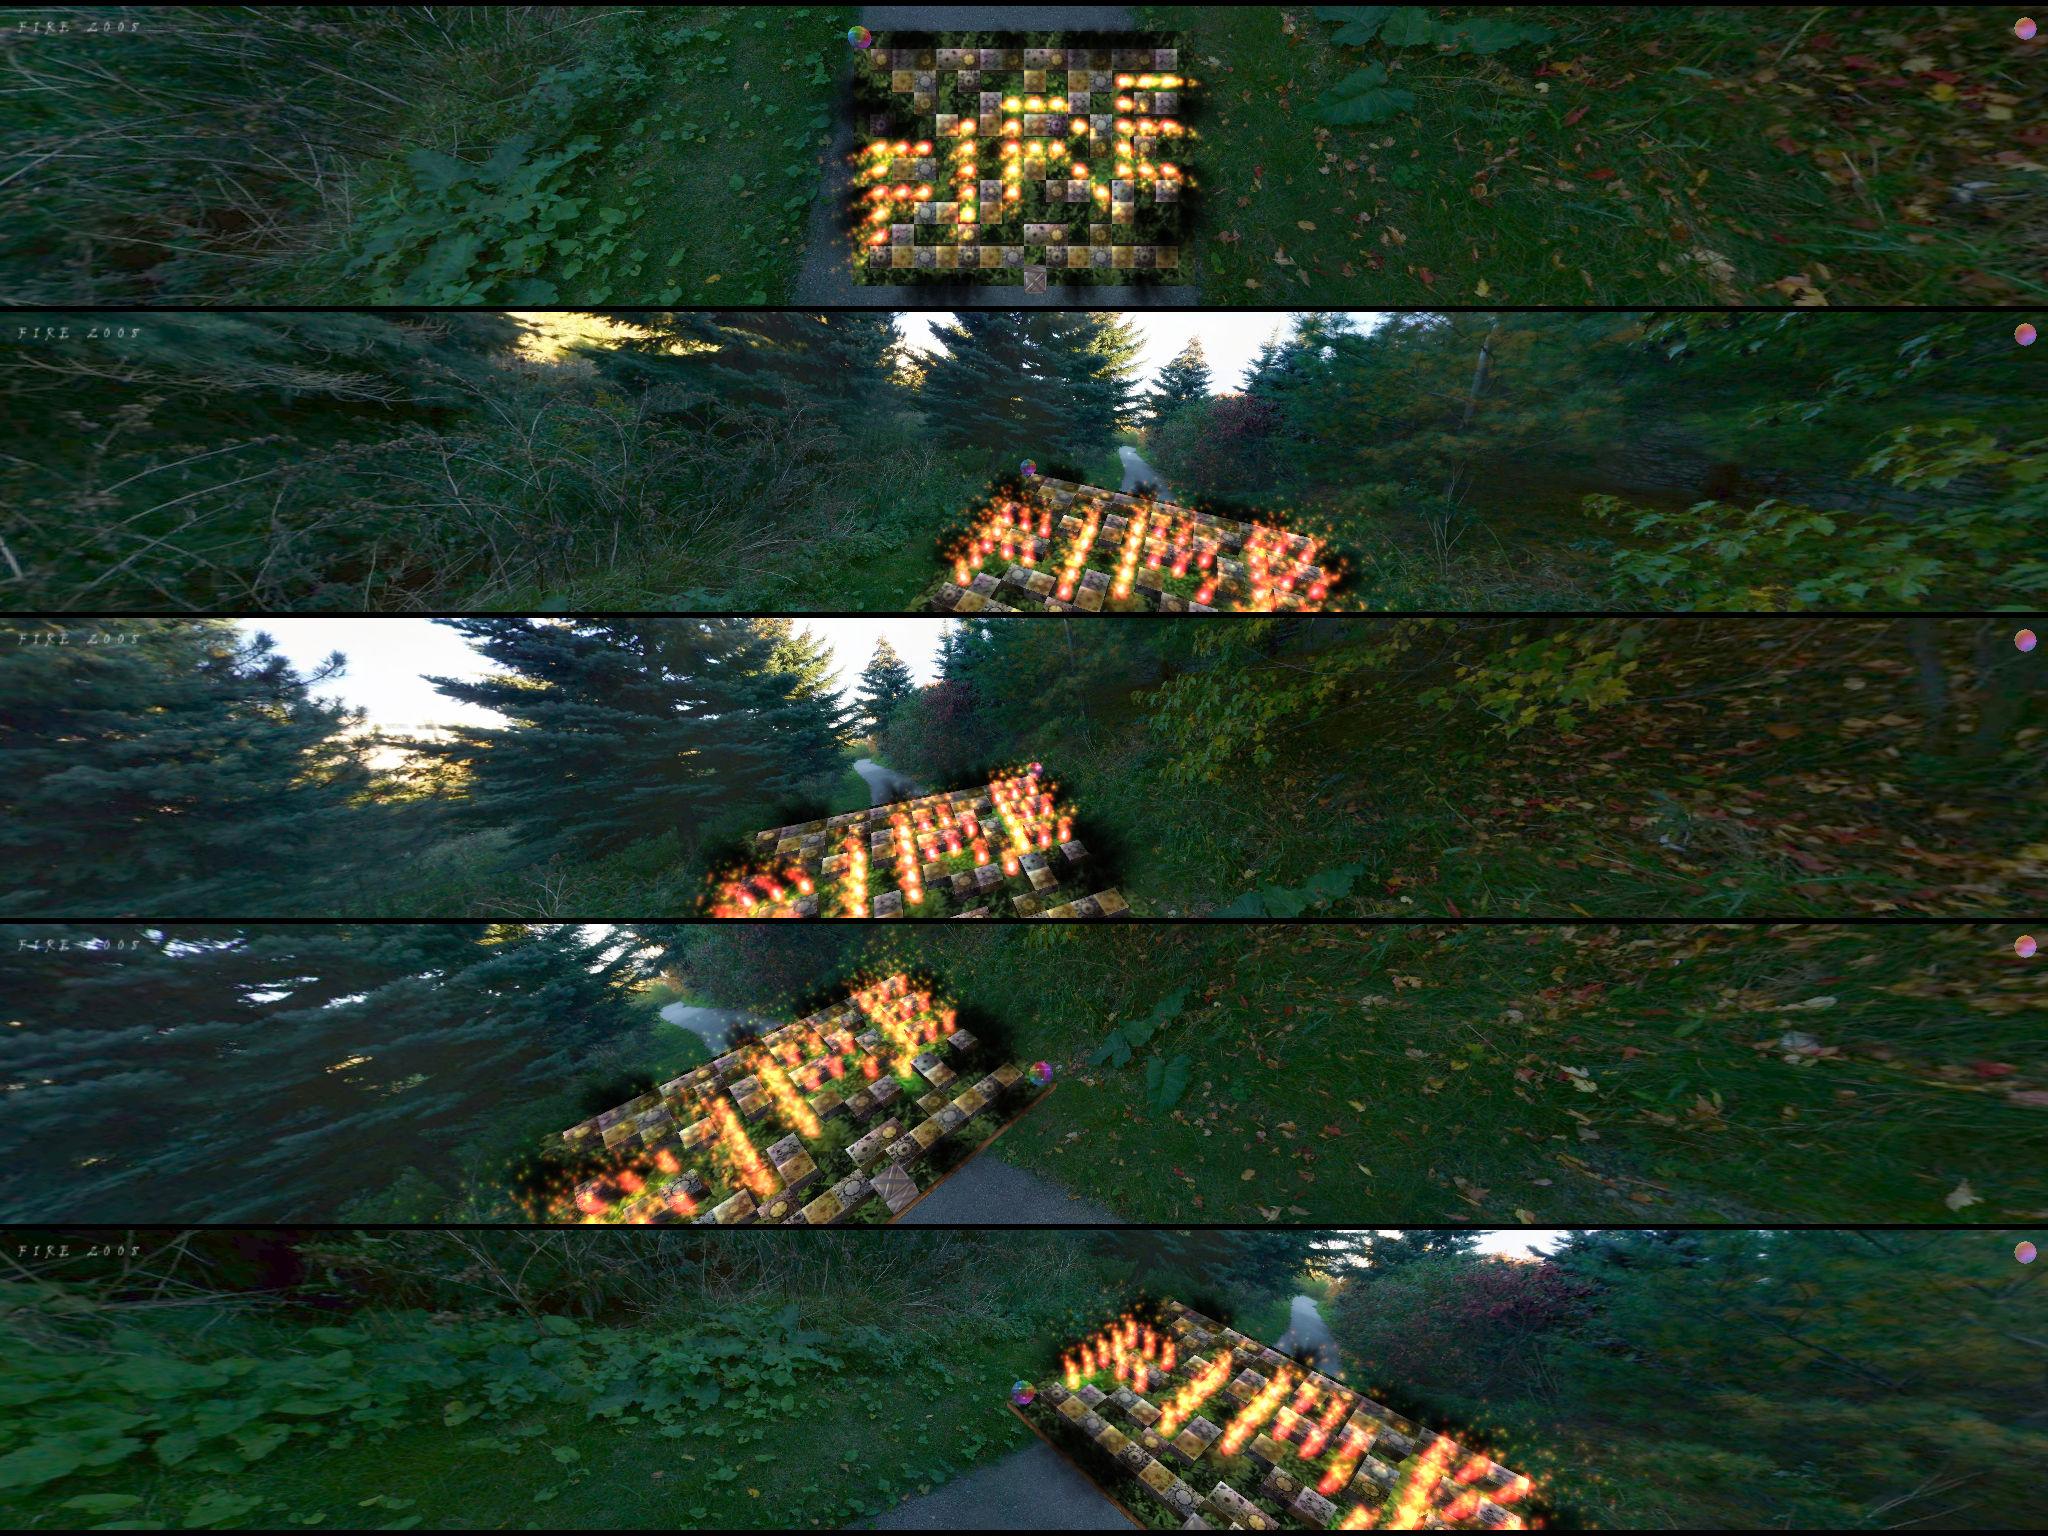 Fire12-N-wide-cam2-crnrs-B.jpg